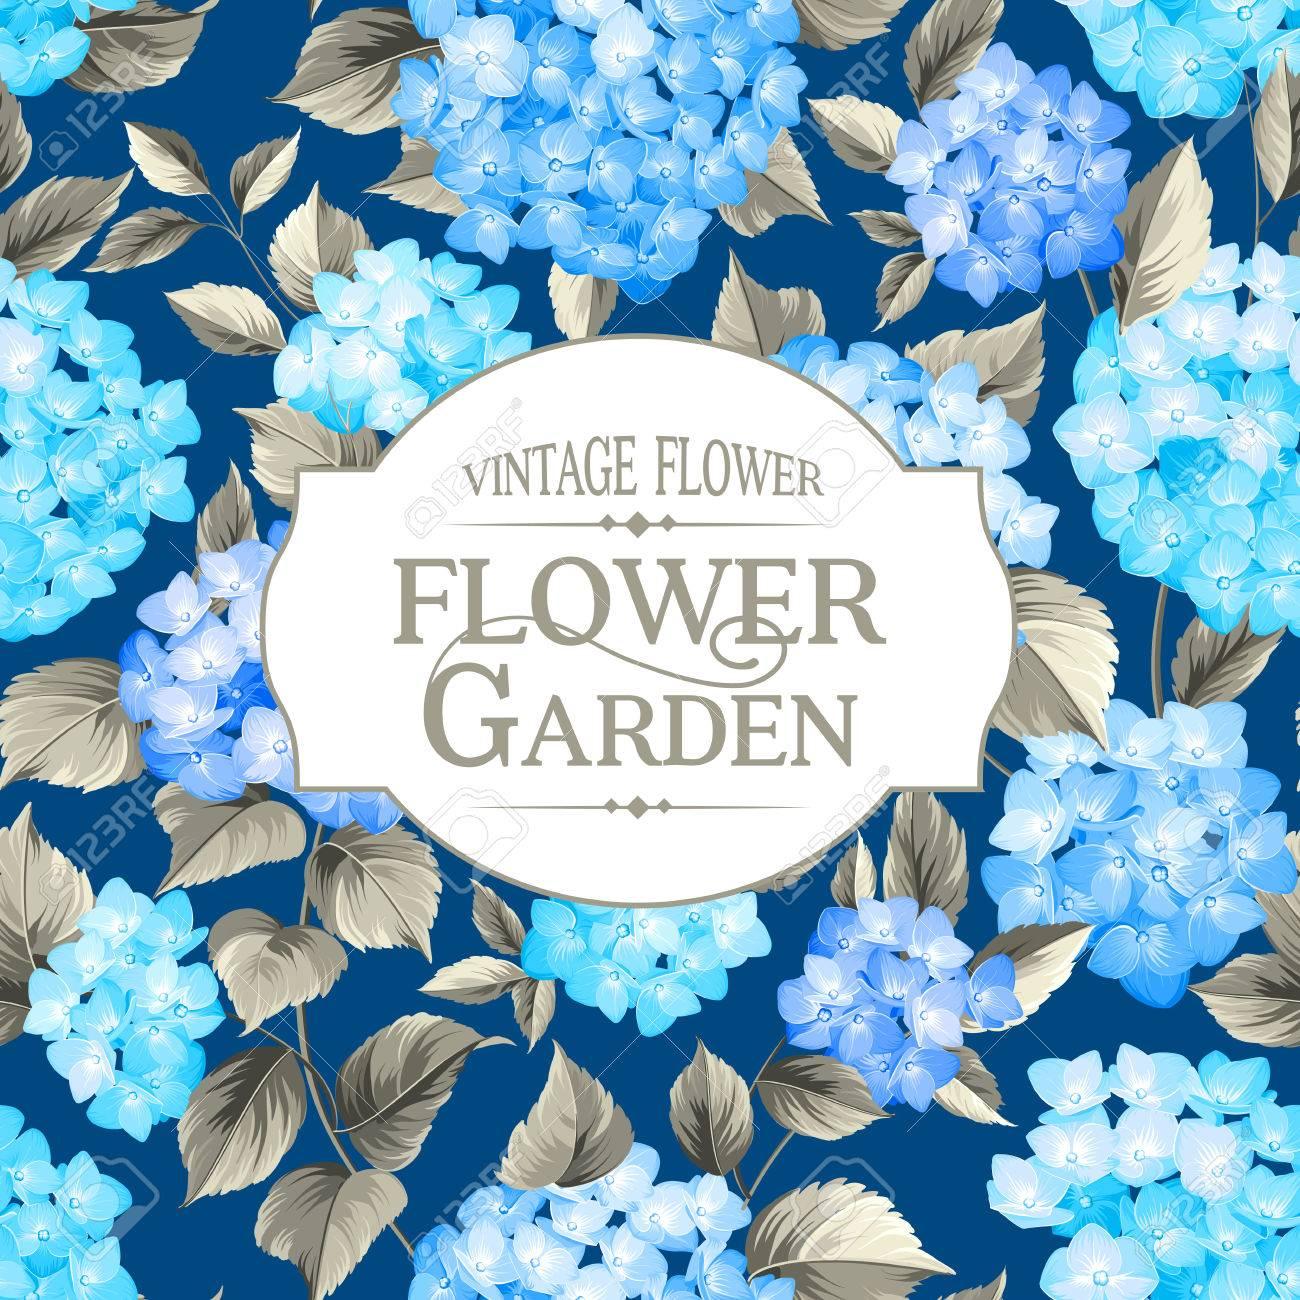 Hydrangea Flowers Vintage Frame Blue Flowers Royalty Free